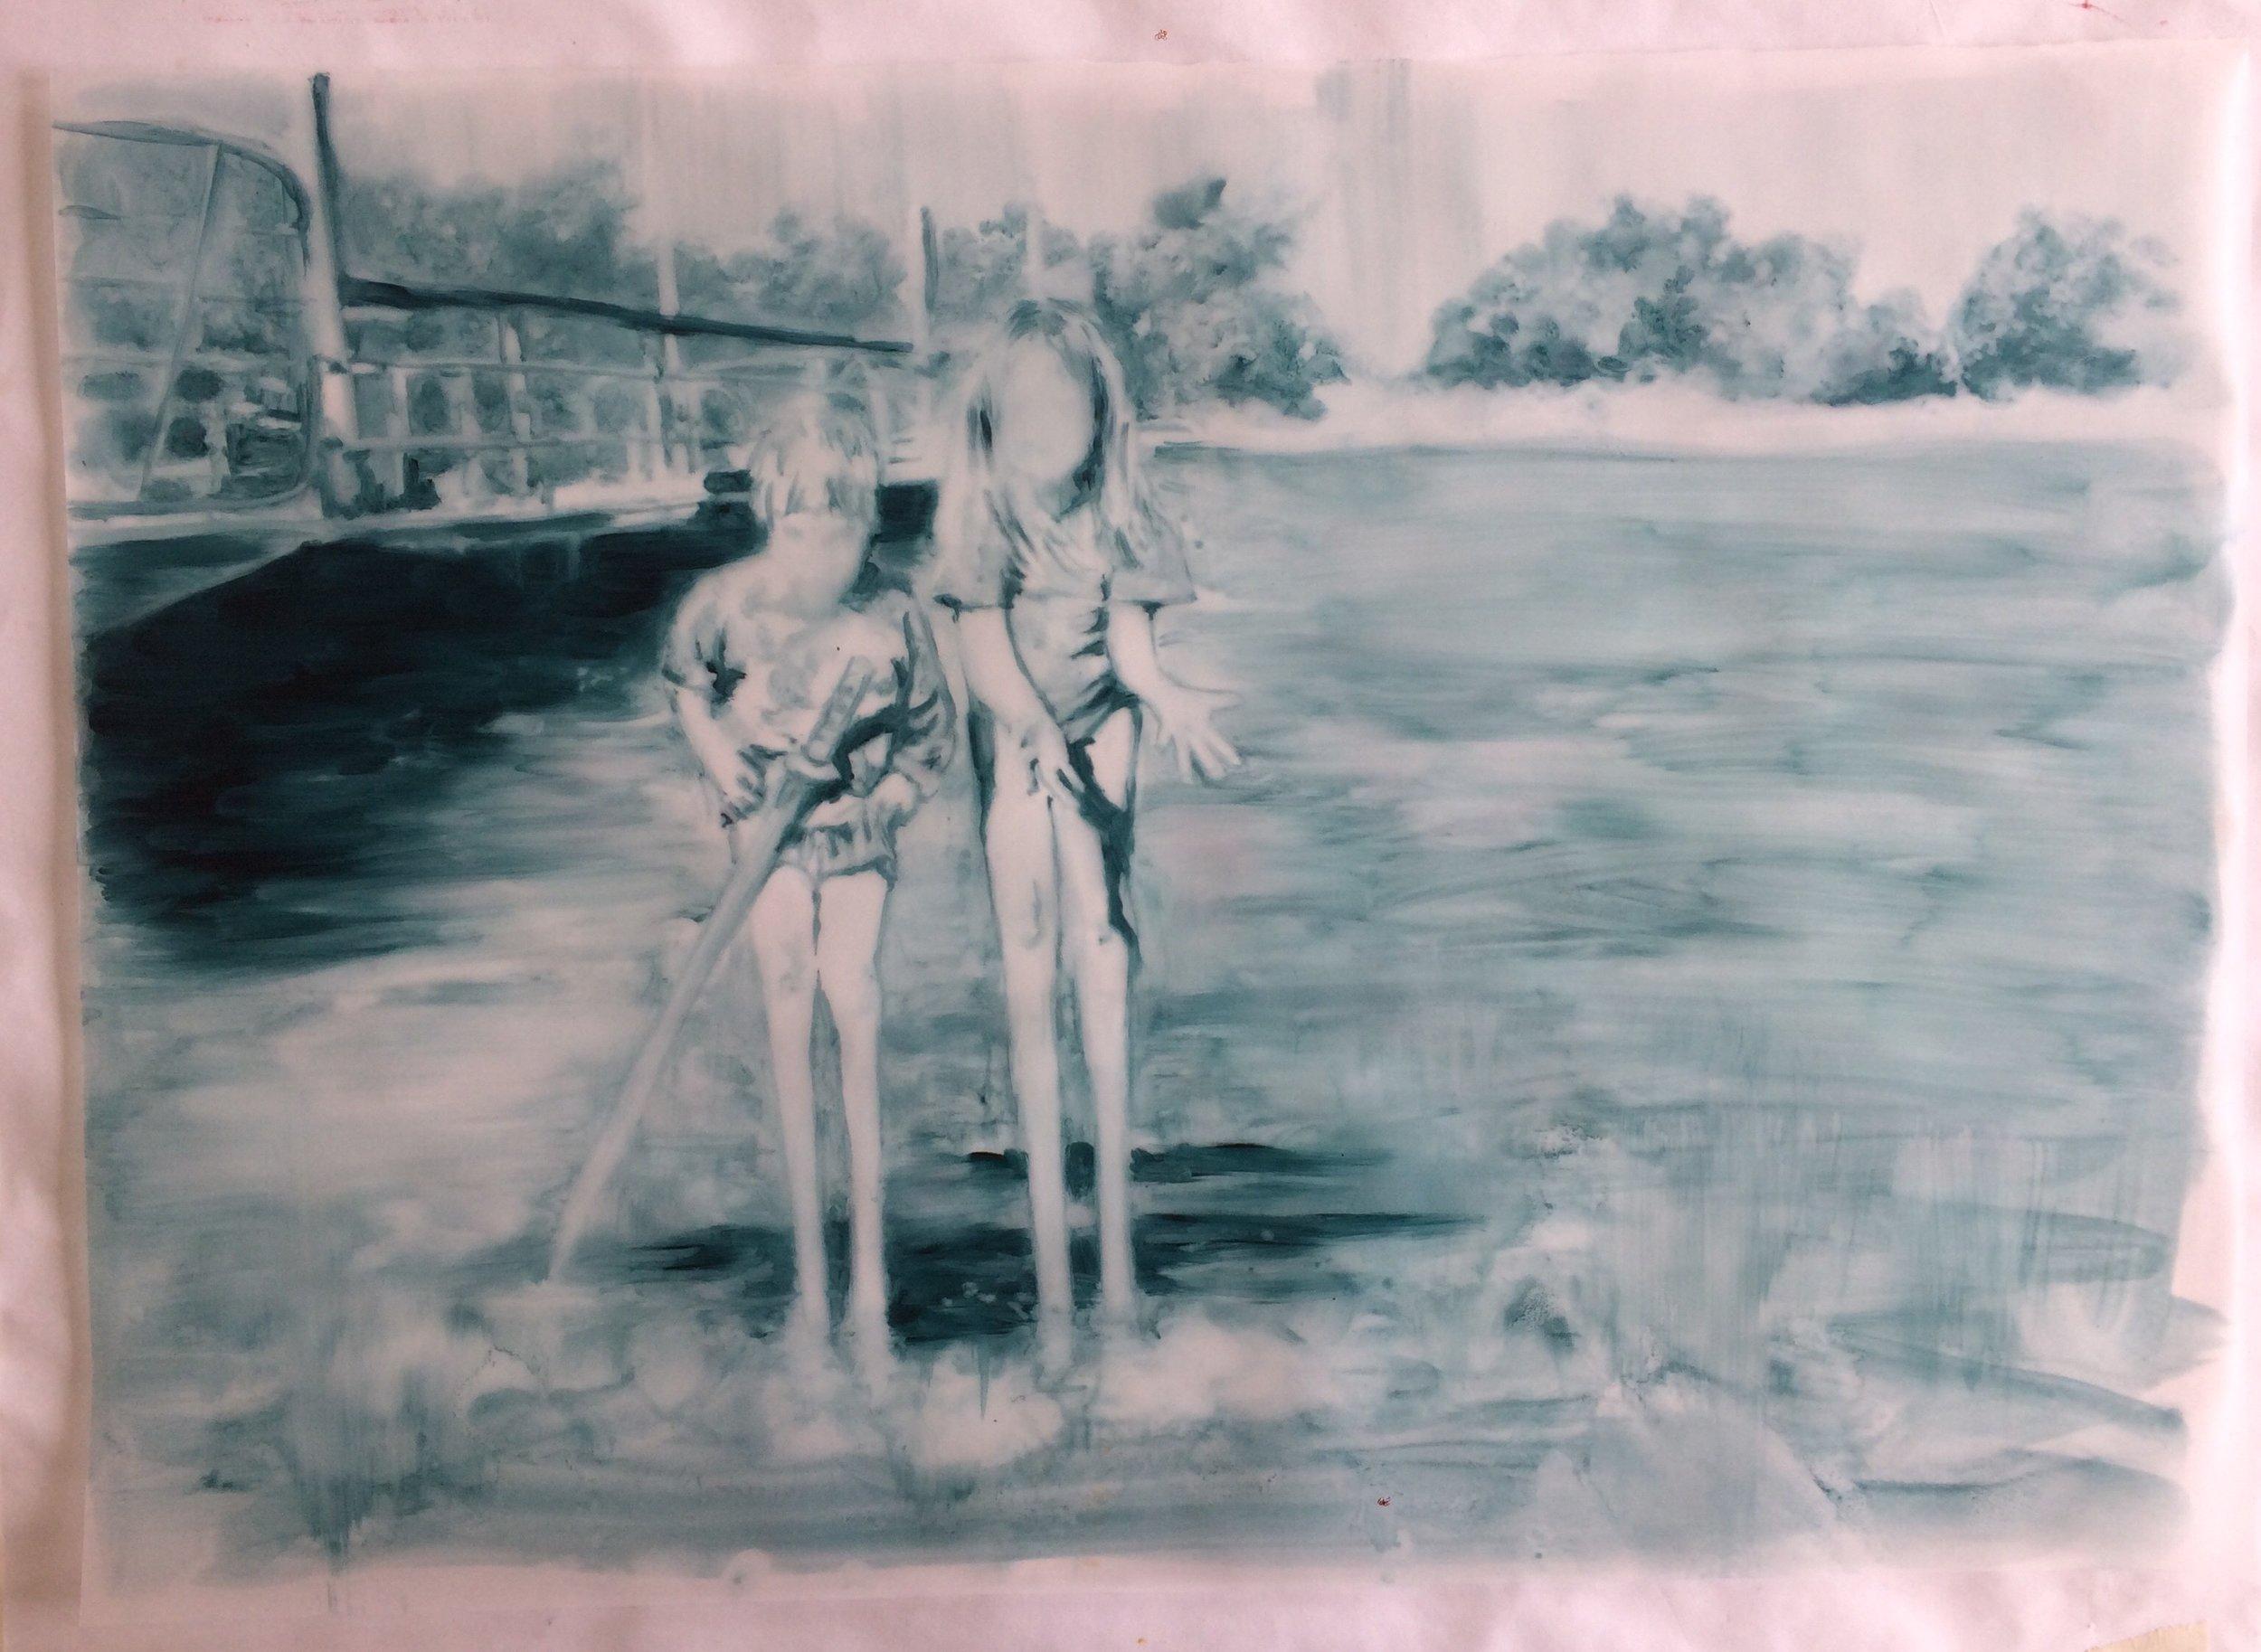 Swinney Ruby, Before the Crossing, 2018  Oil on Tracing Paper  59,5cm x 42,5cm  Framed – R 9500  Unframed – R 8500